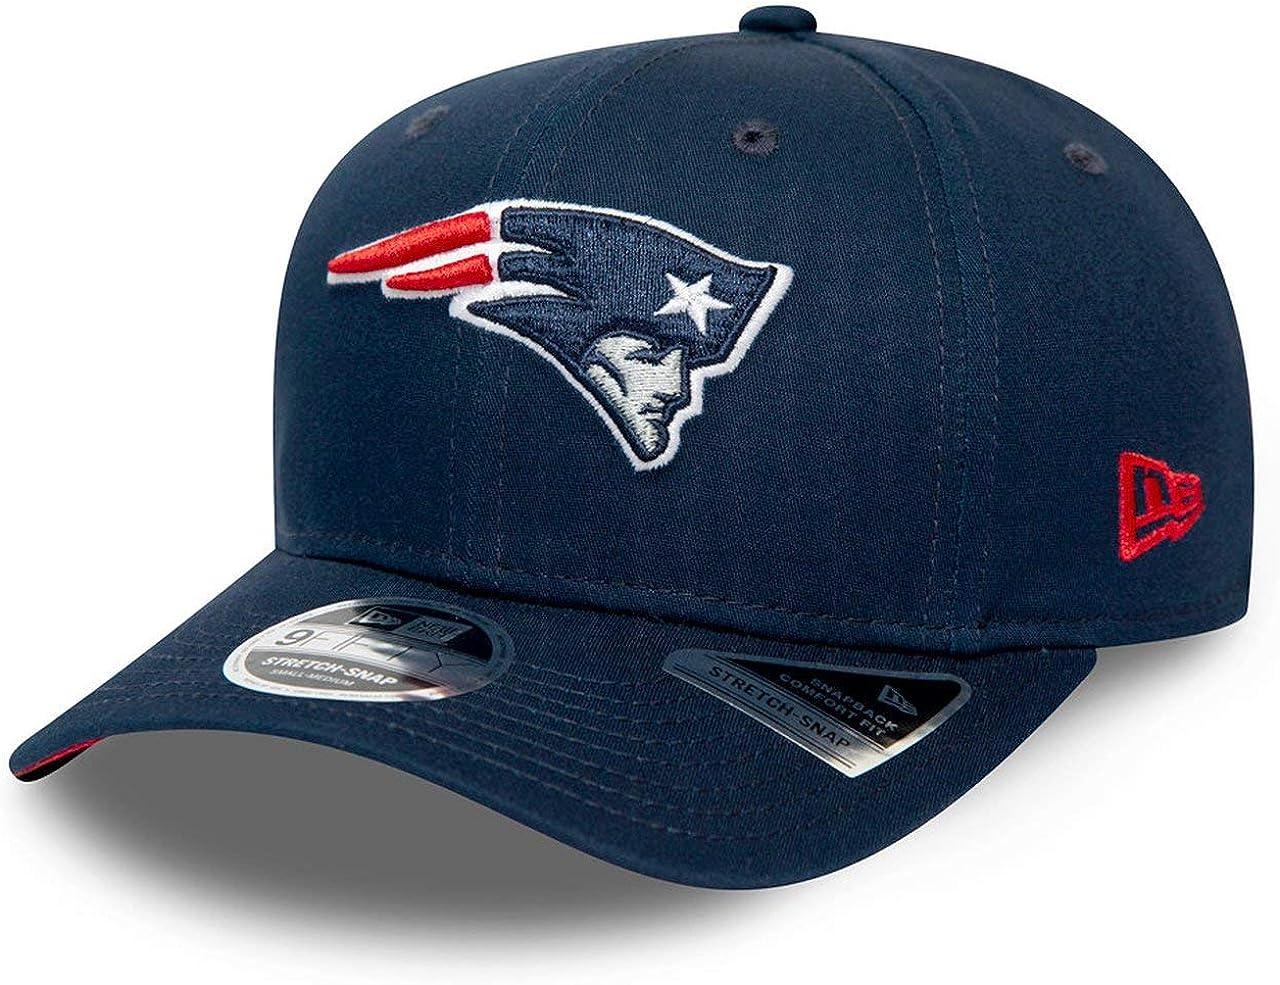 New Era Cappellino 9Fifty Stretch Patriots OTCEra Berretto Baseball NFL cap Snapback